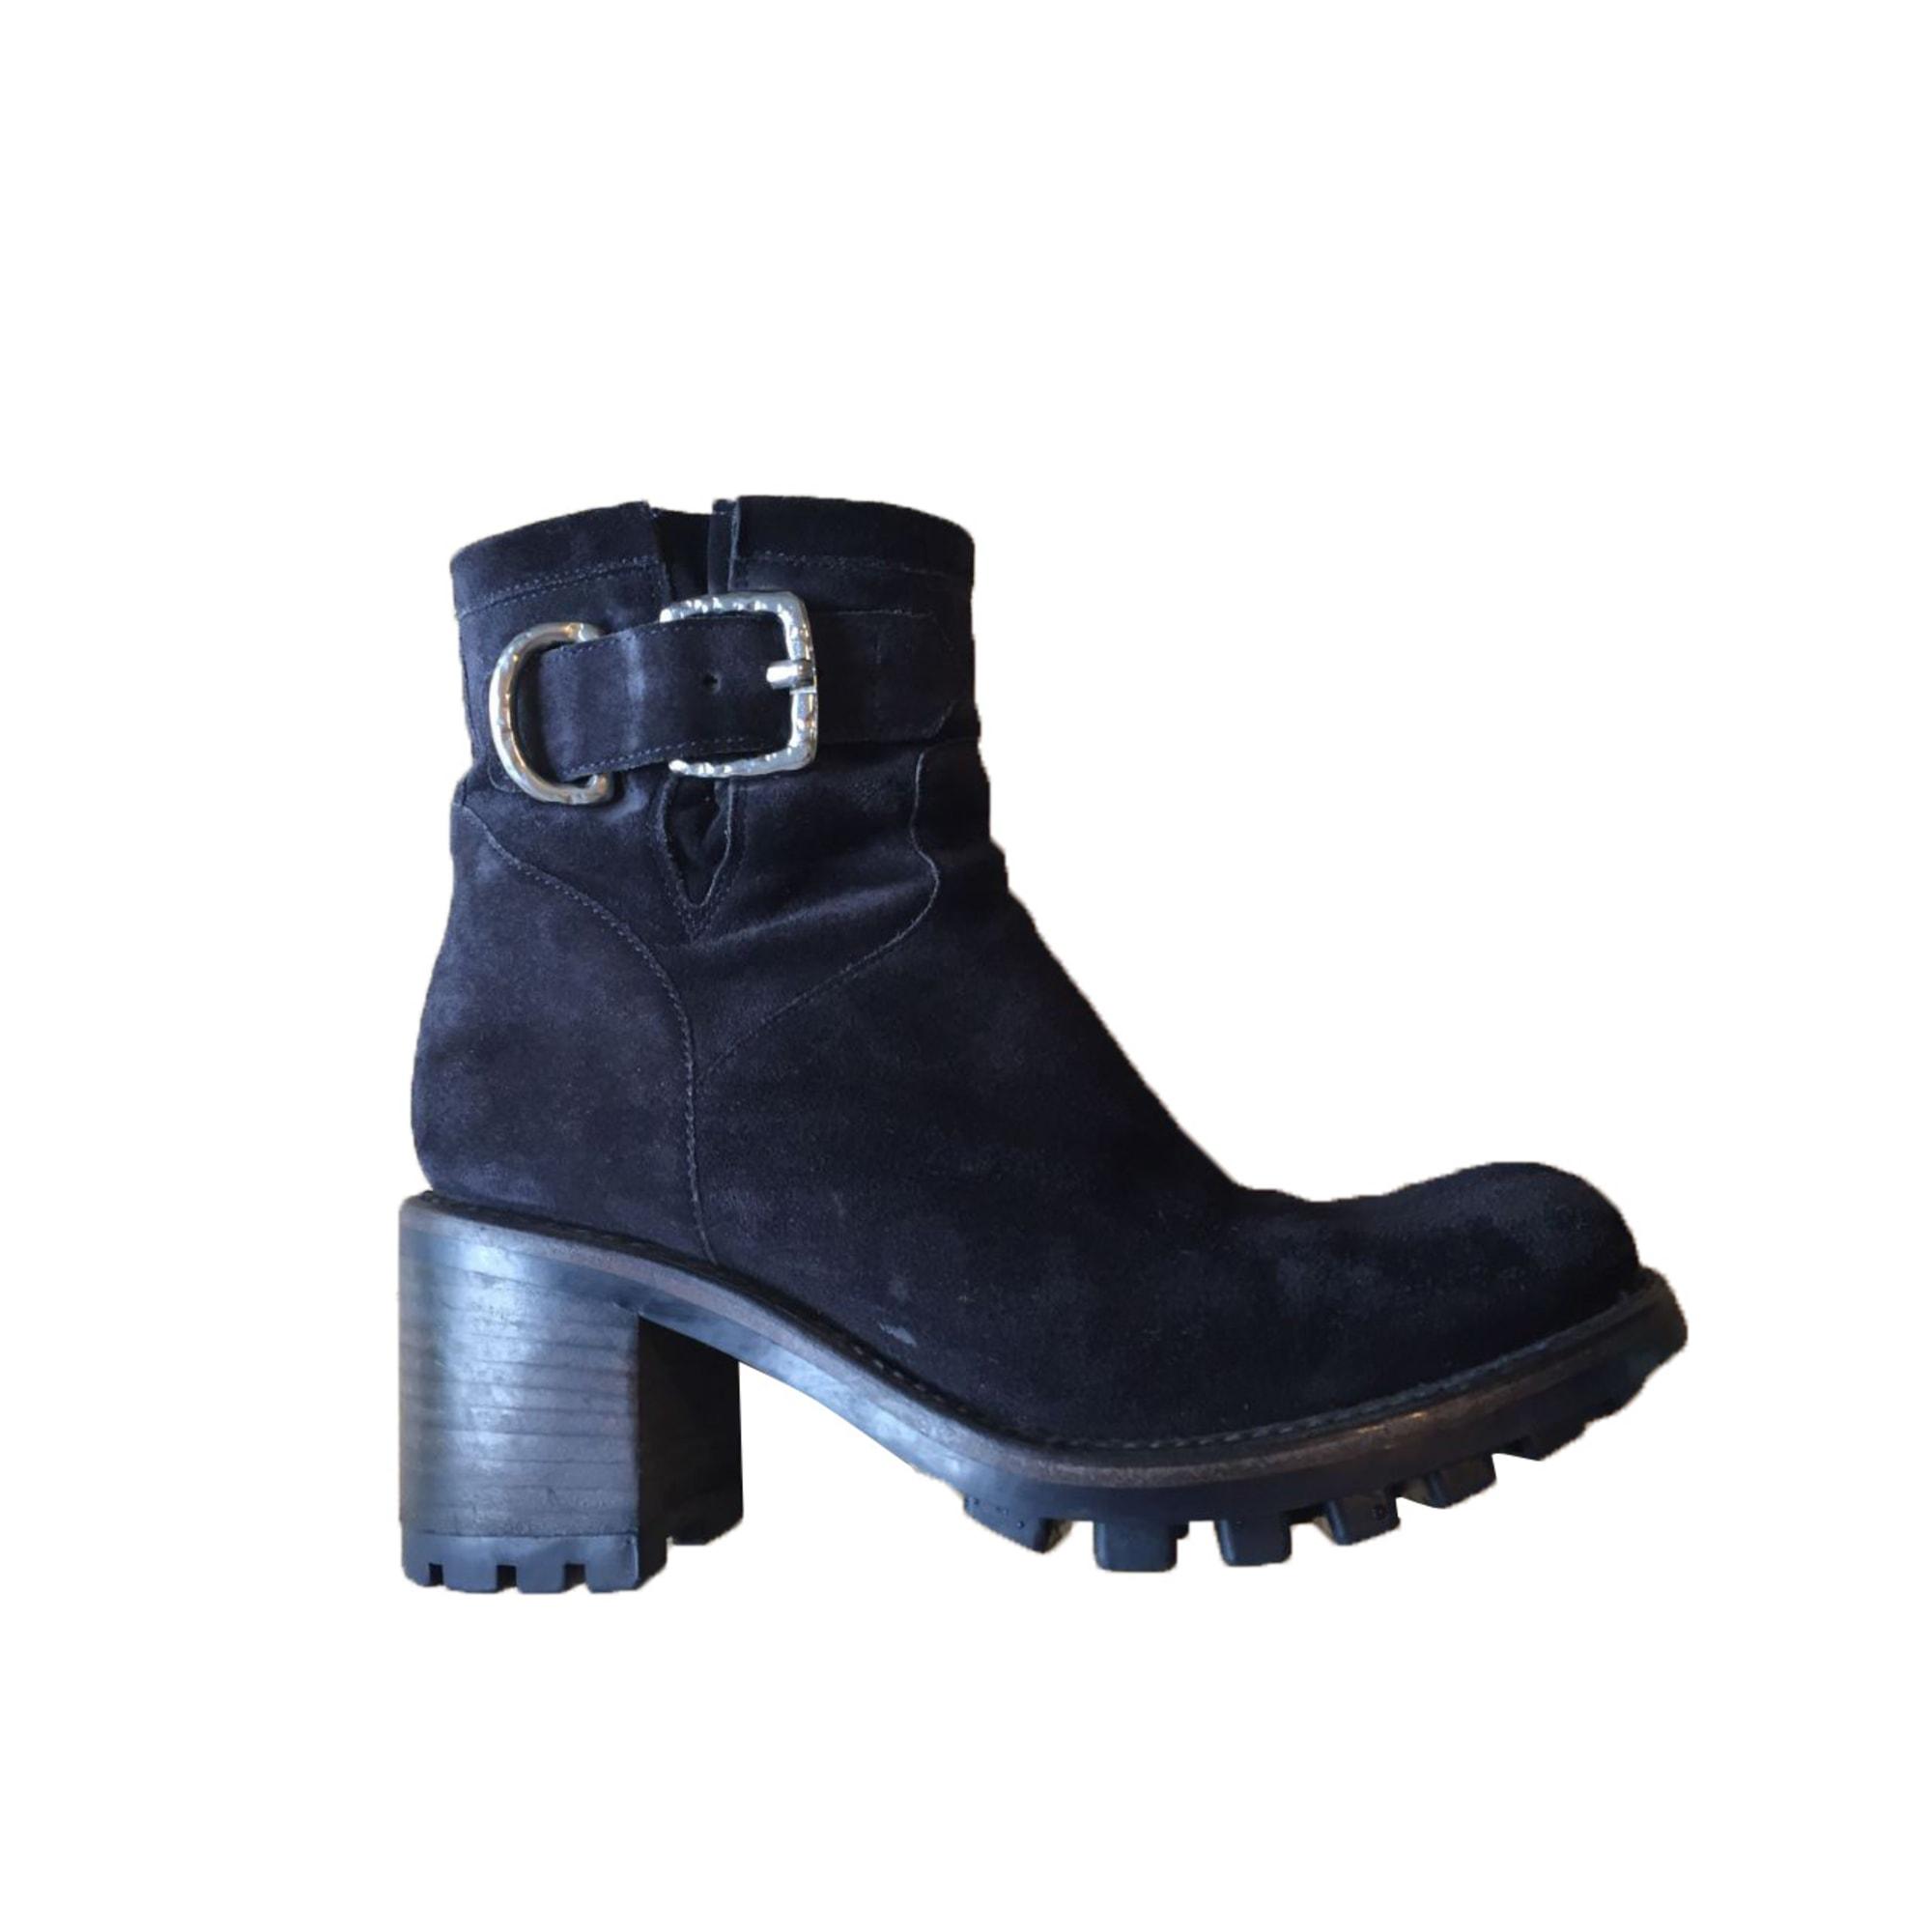 Cowboystiefel, Stiefeletten, Westernstiefel FREE LANCE Blau, marineblau, türkisblau